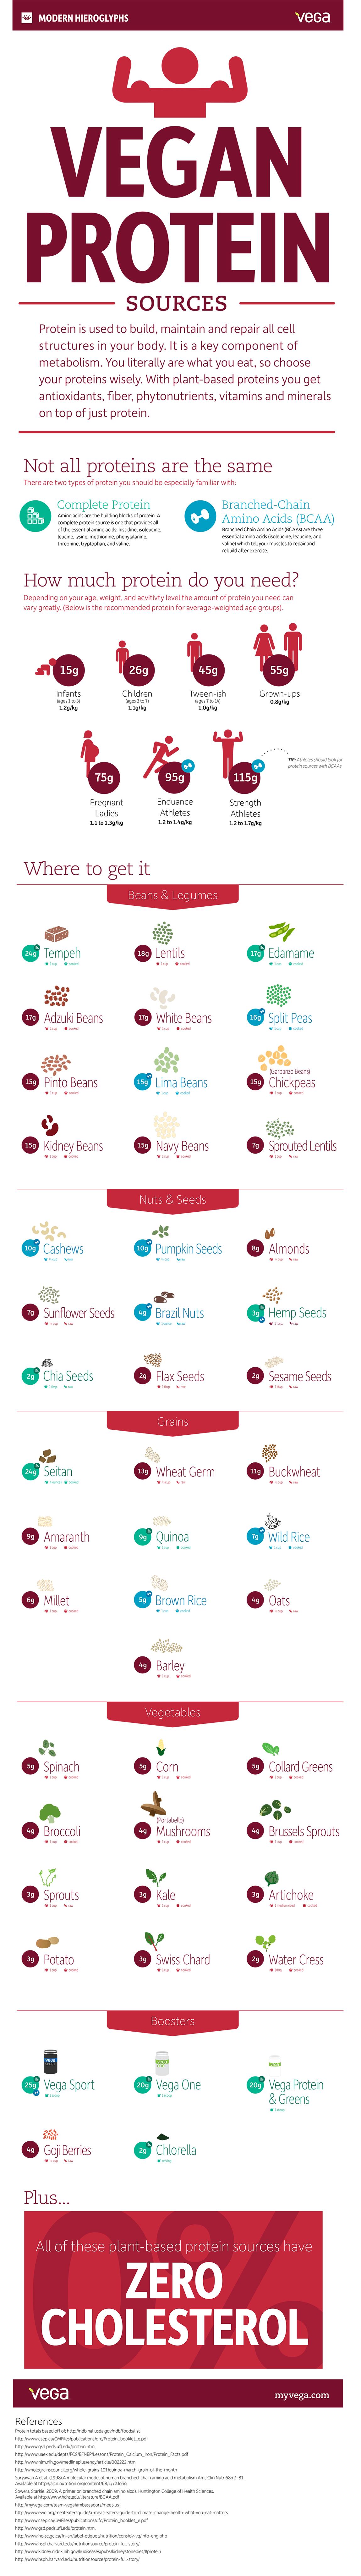 Best Vegan Protein Sources Infographic In